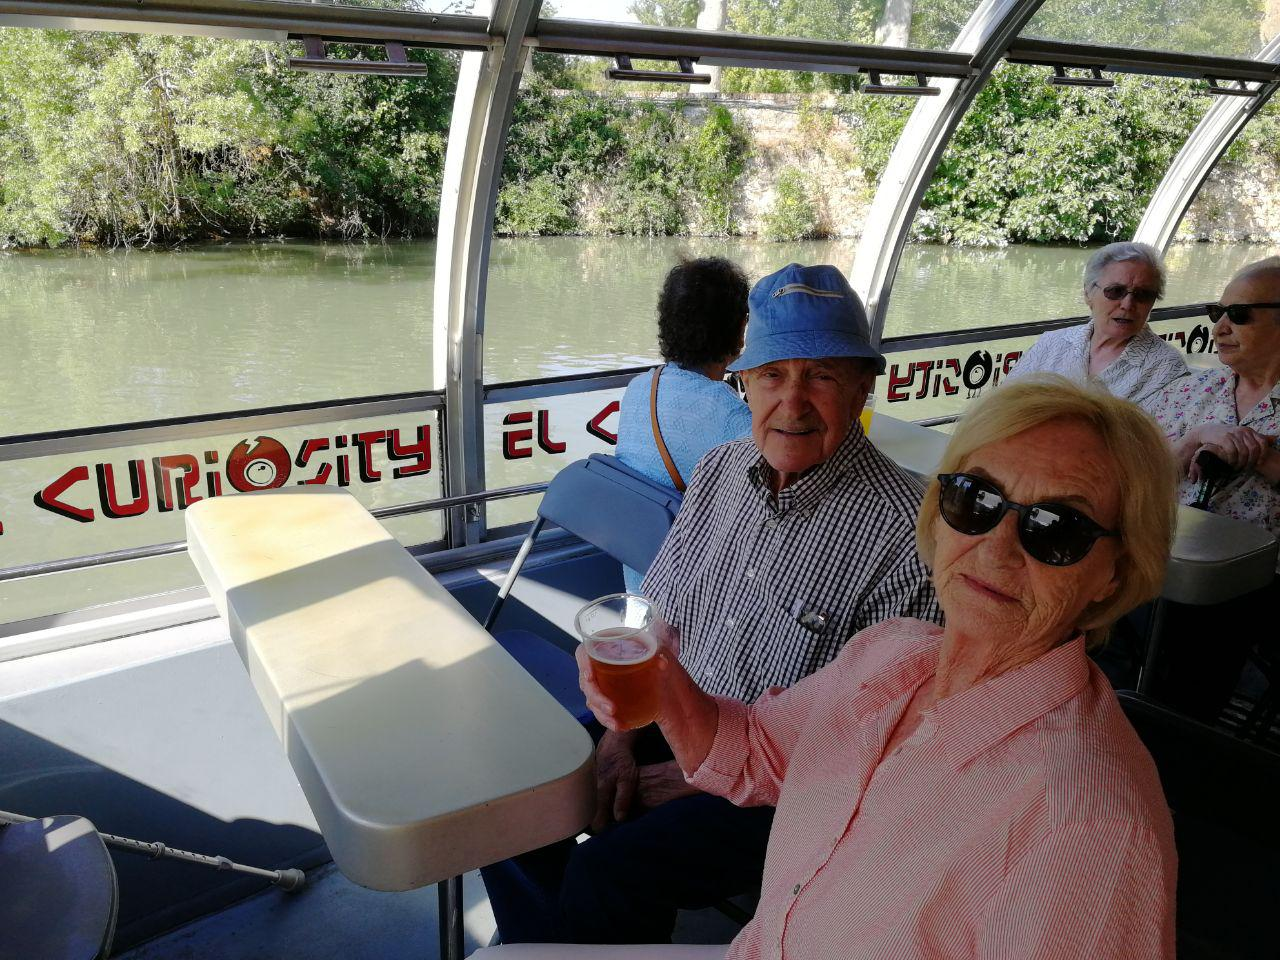 Barco Curiosity Aranjuez (10)